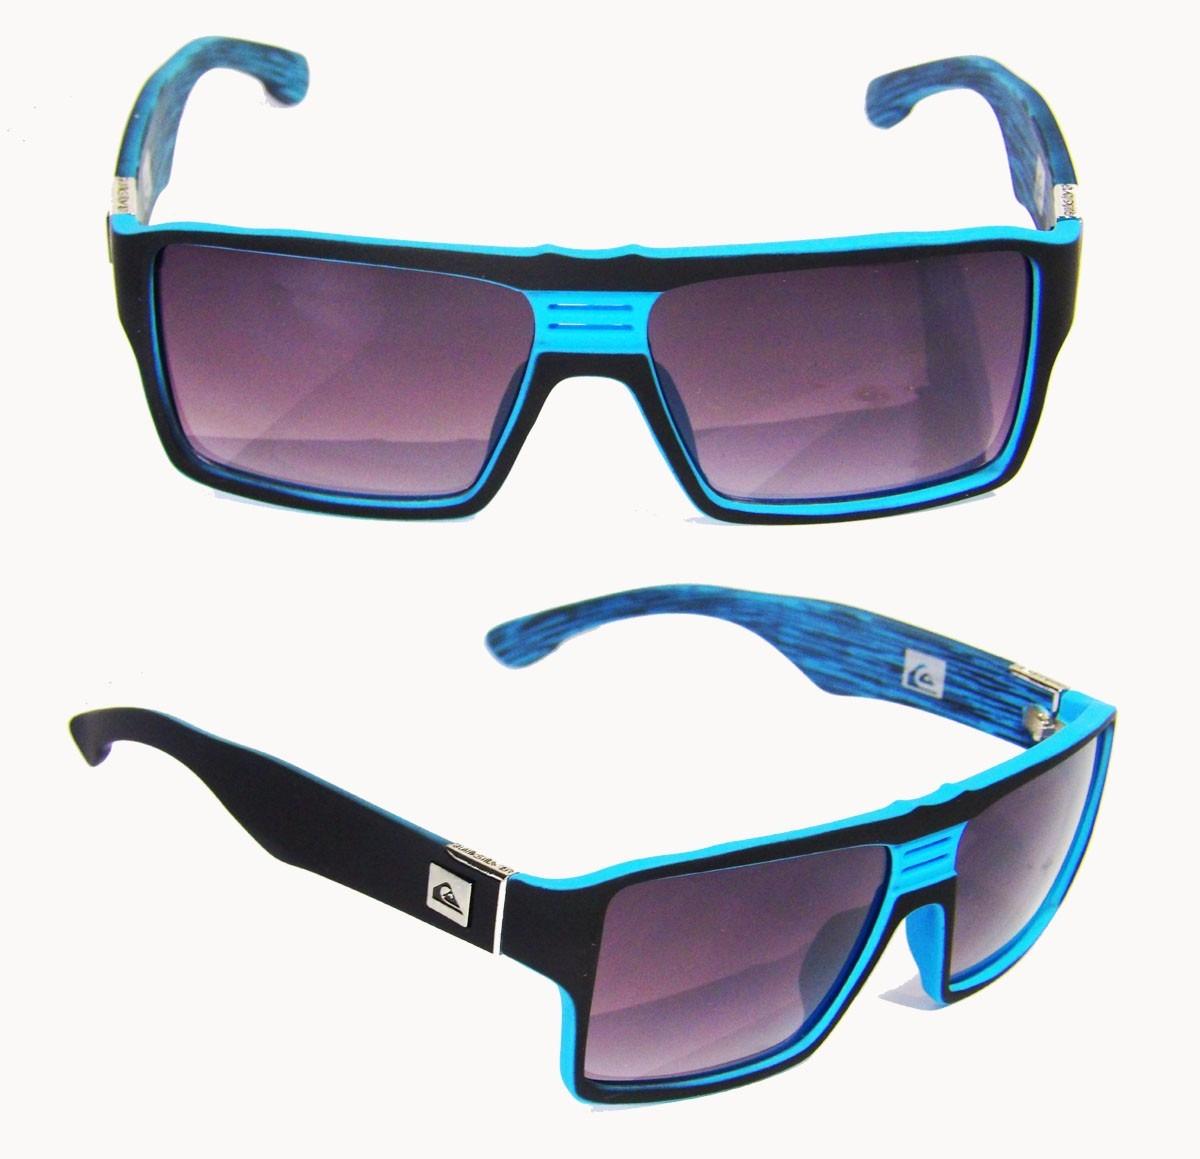 d5848b45c Oculos Quick Silver Enose + Brinde + Frete Gratis - R$ 112,90 em ...